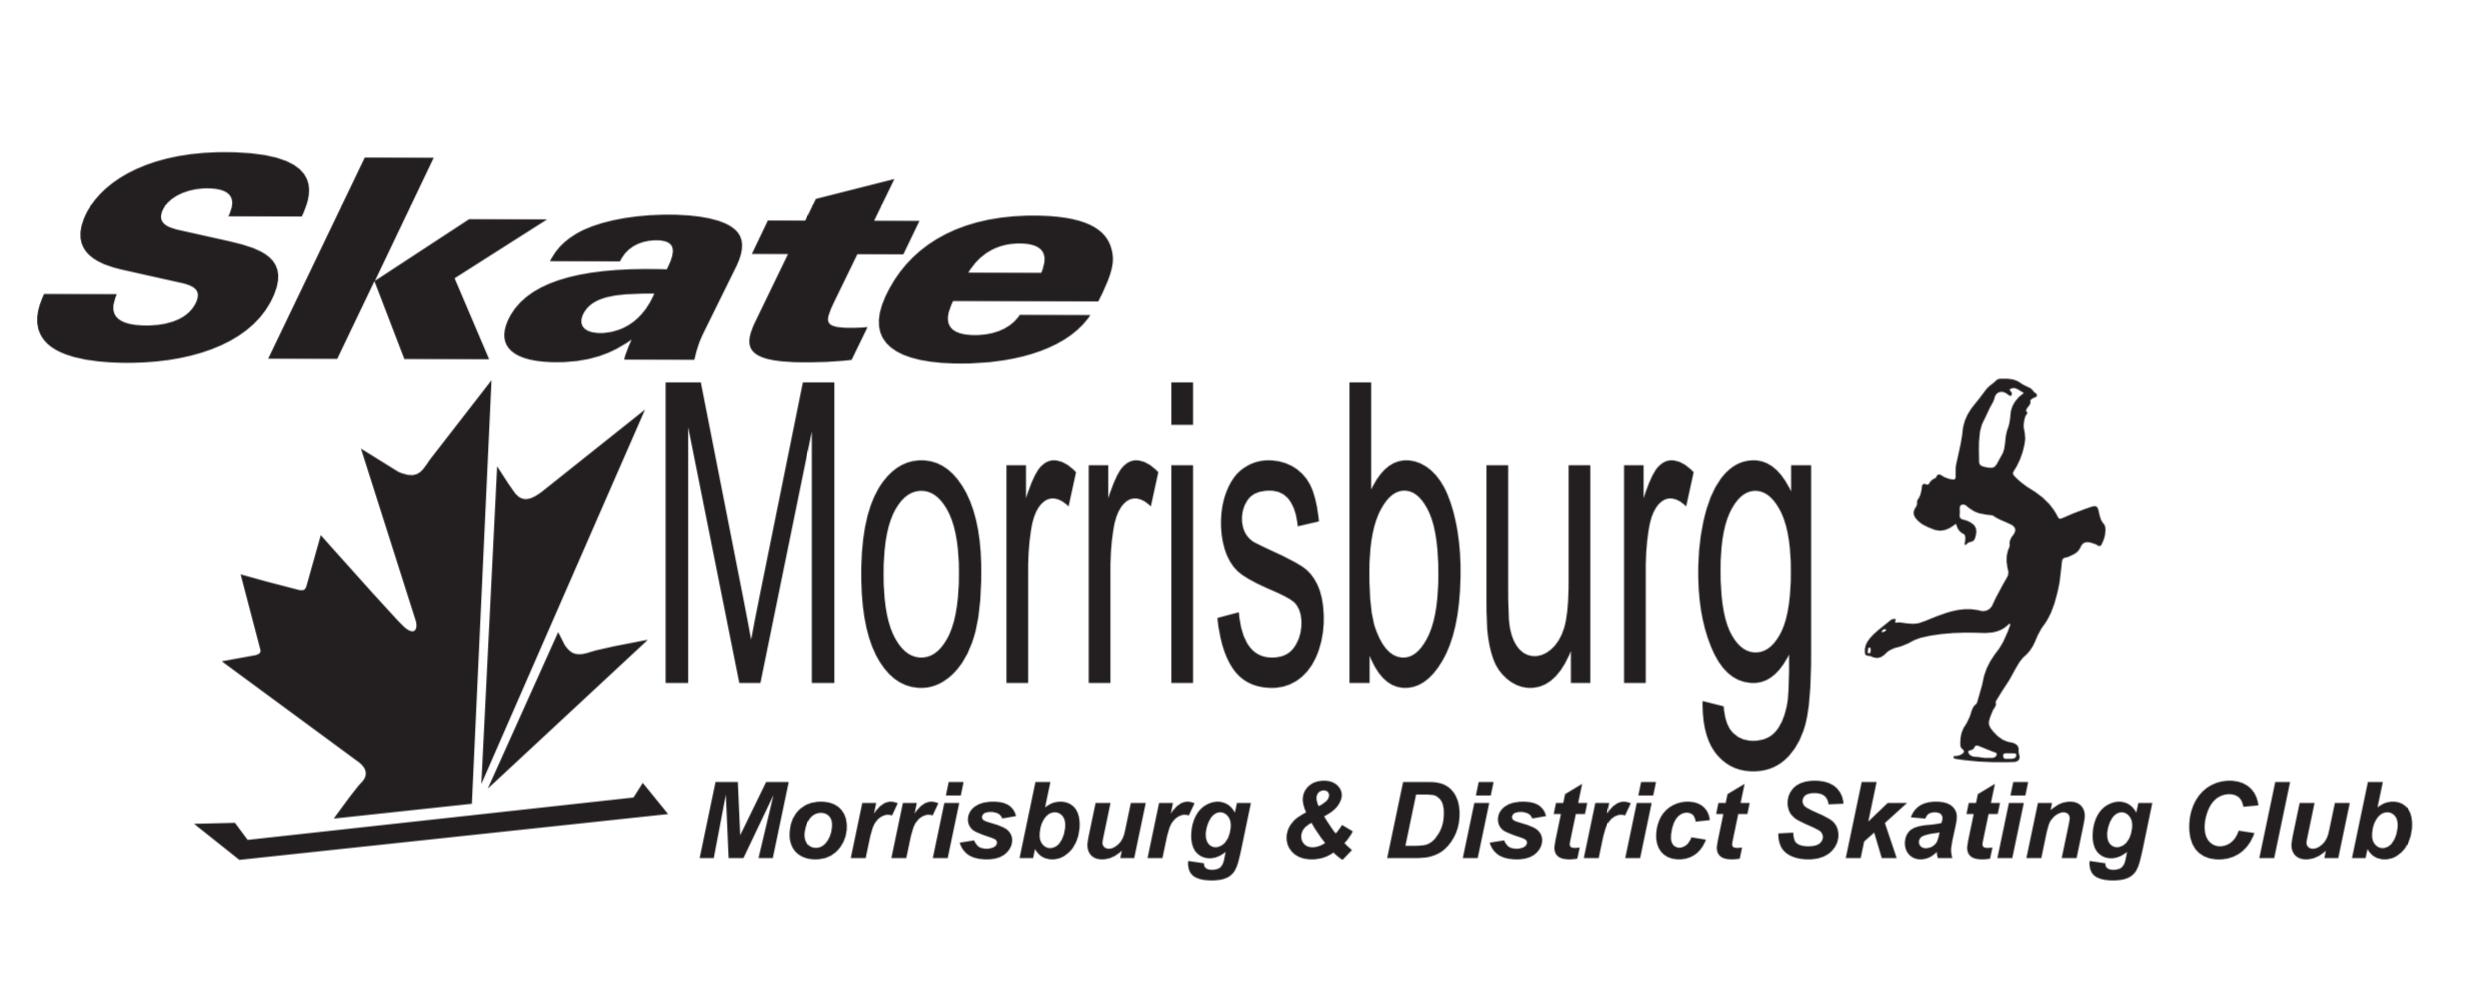 Morrisburg & District Skating Club